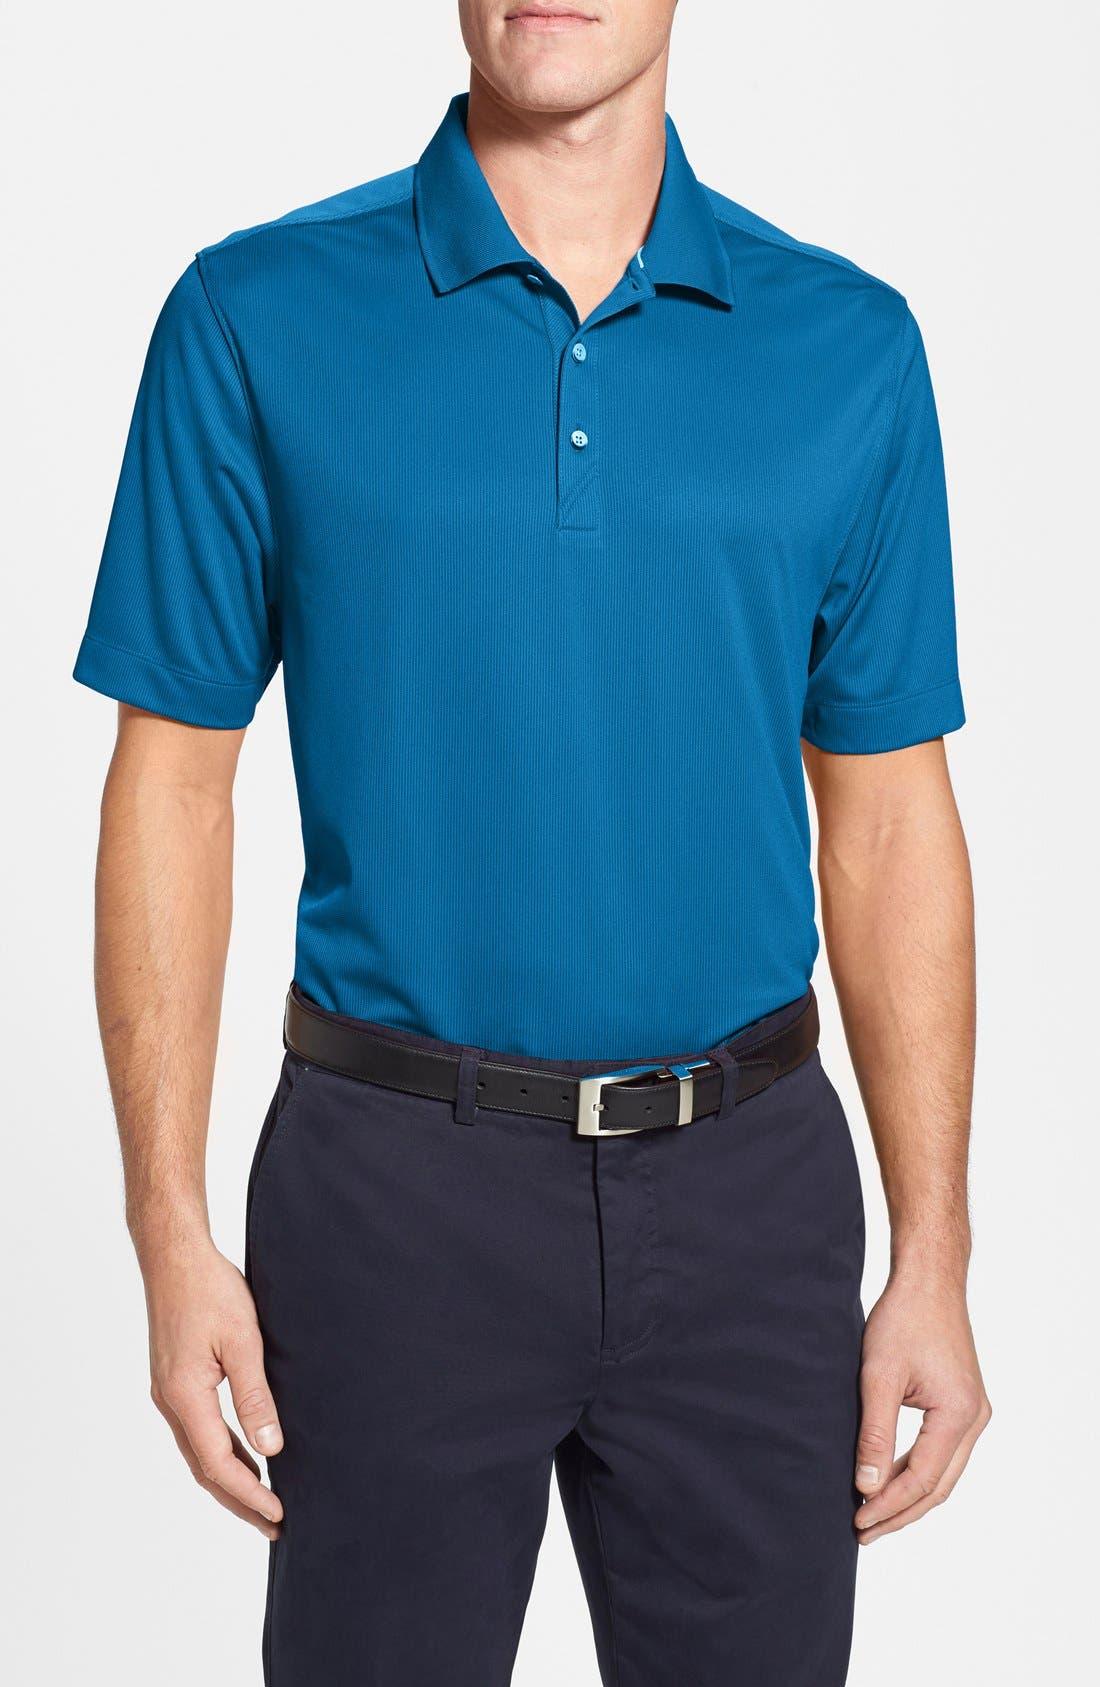 Glendale DryTec Moisture Wicking Polo,                         Main,                         color, 433